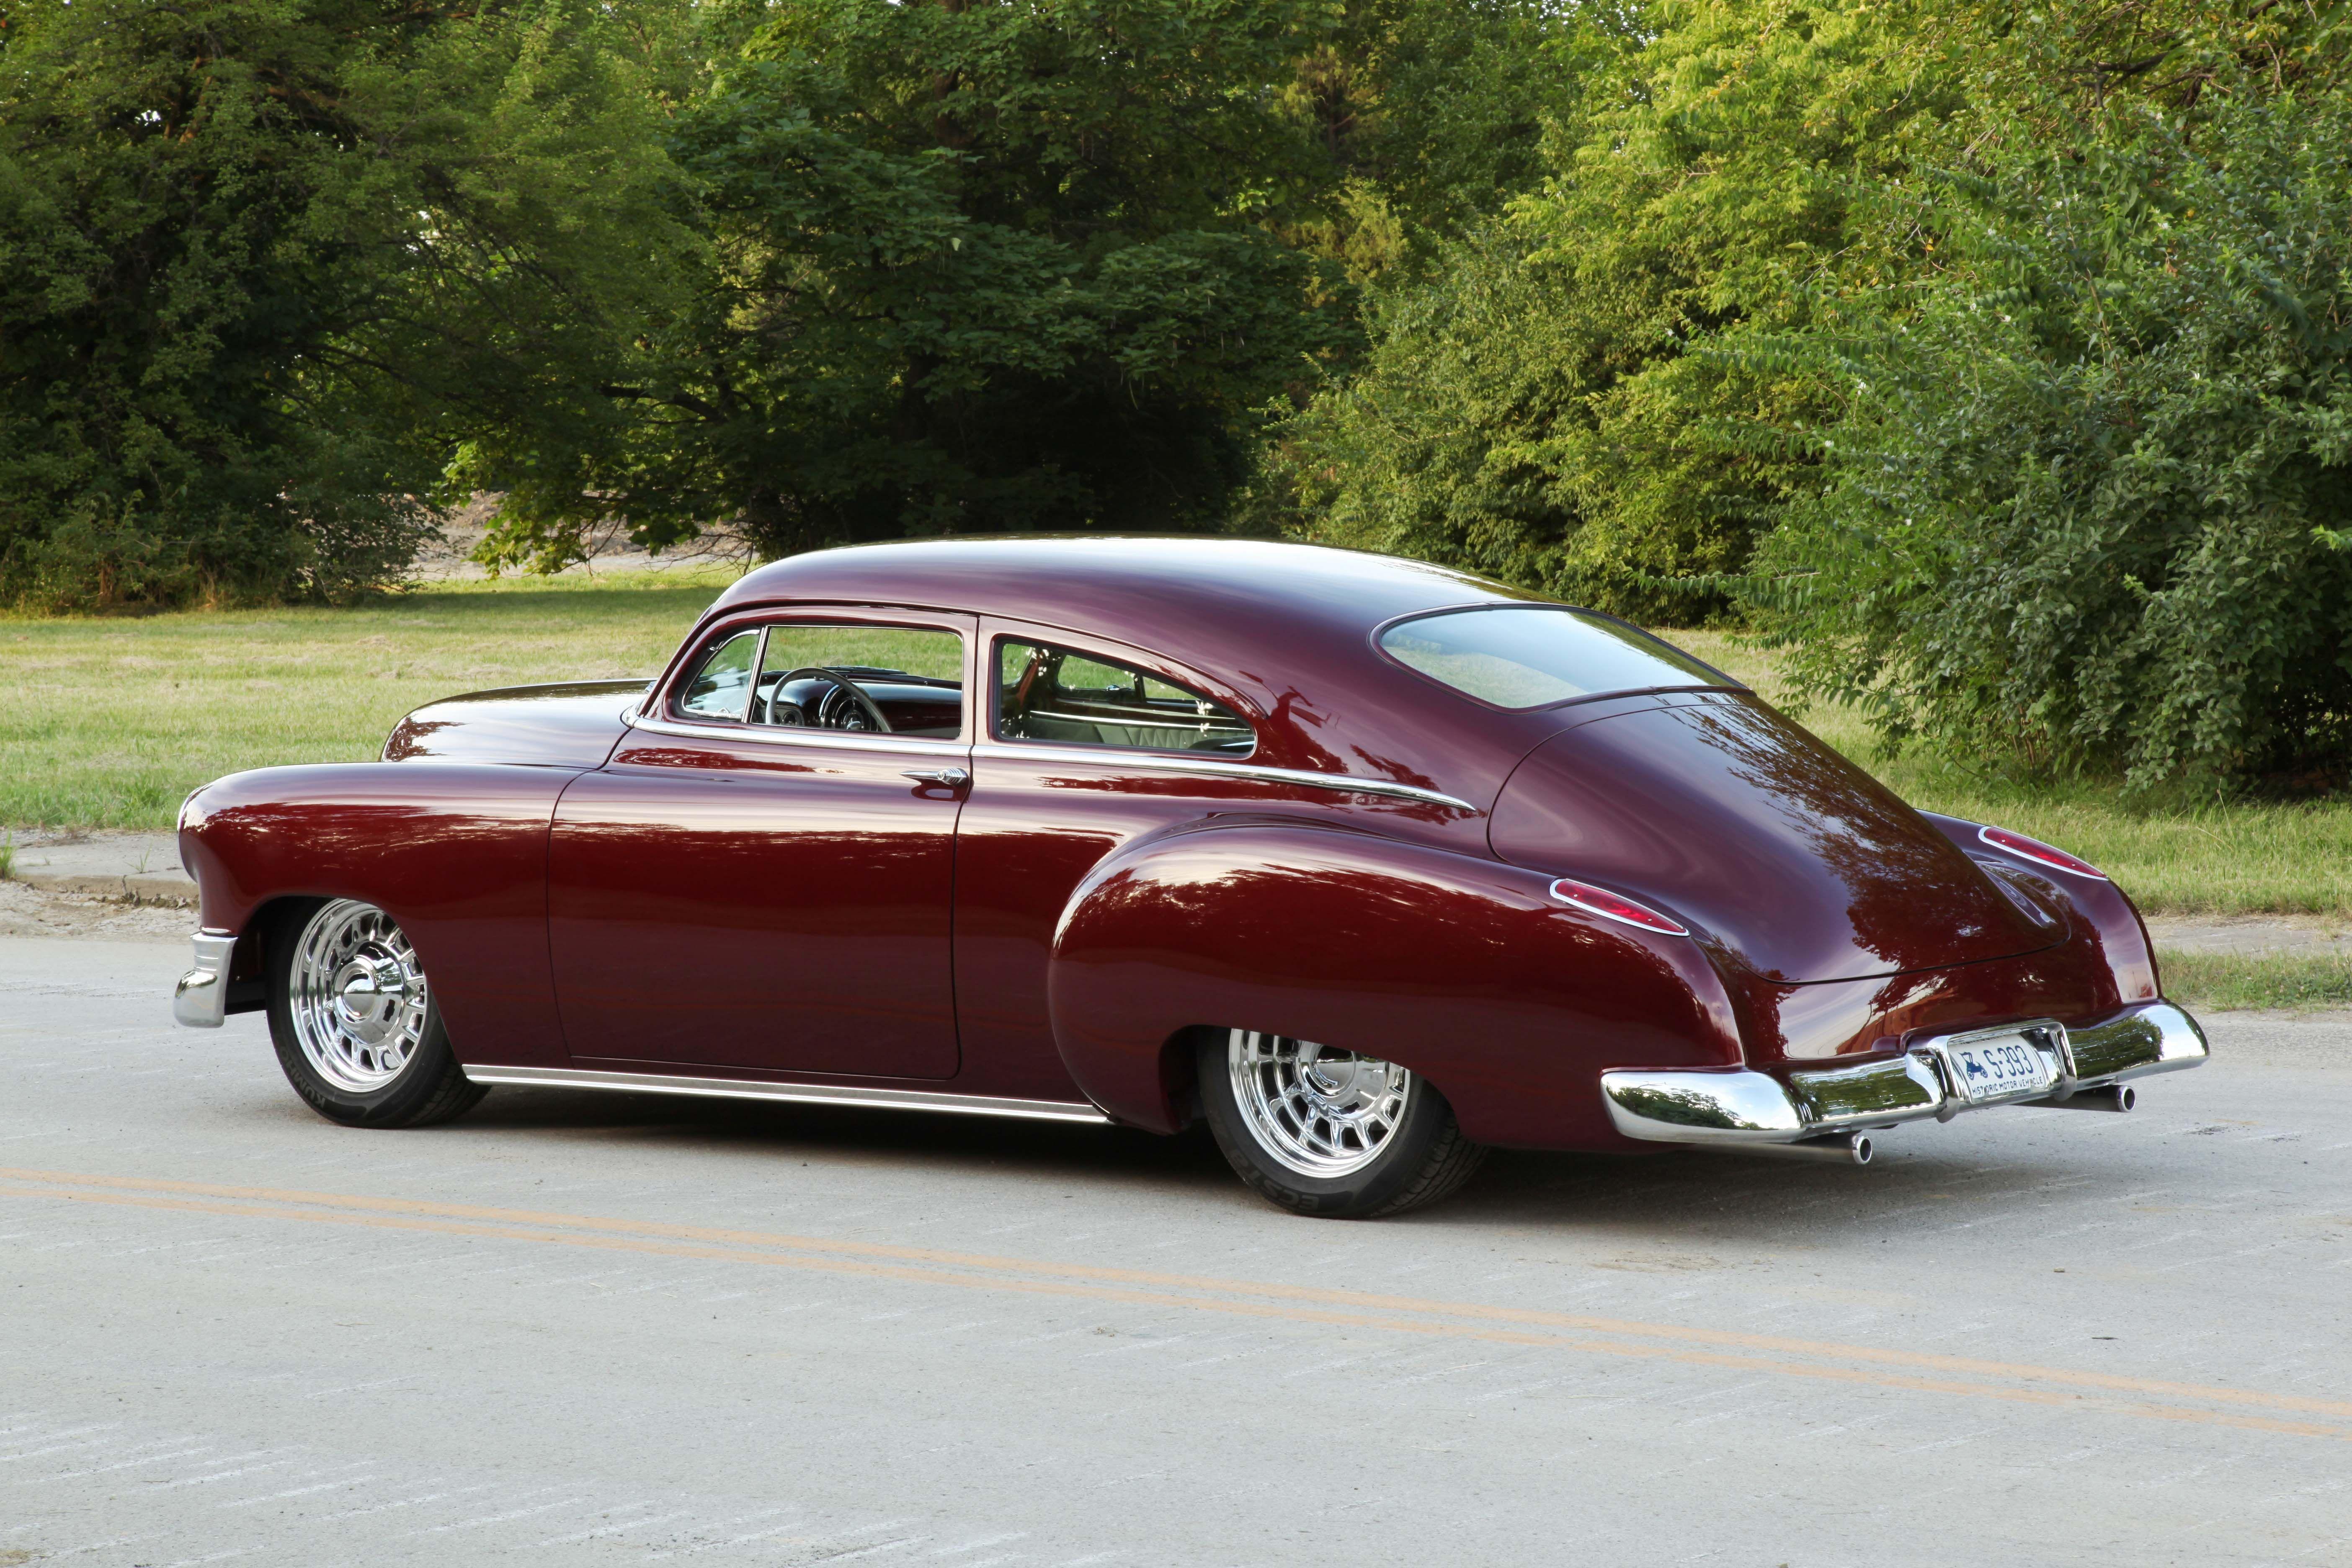 1950 Chevy Fleetline sports a blown-six! - Hot Rod Network